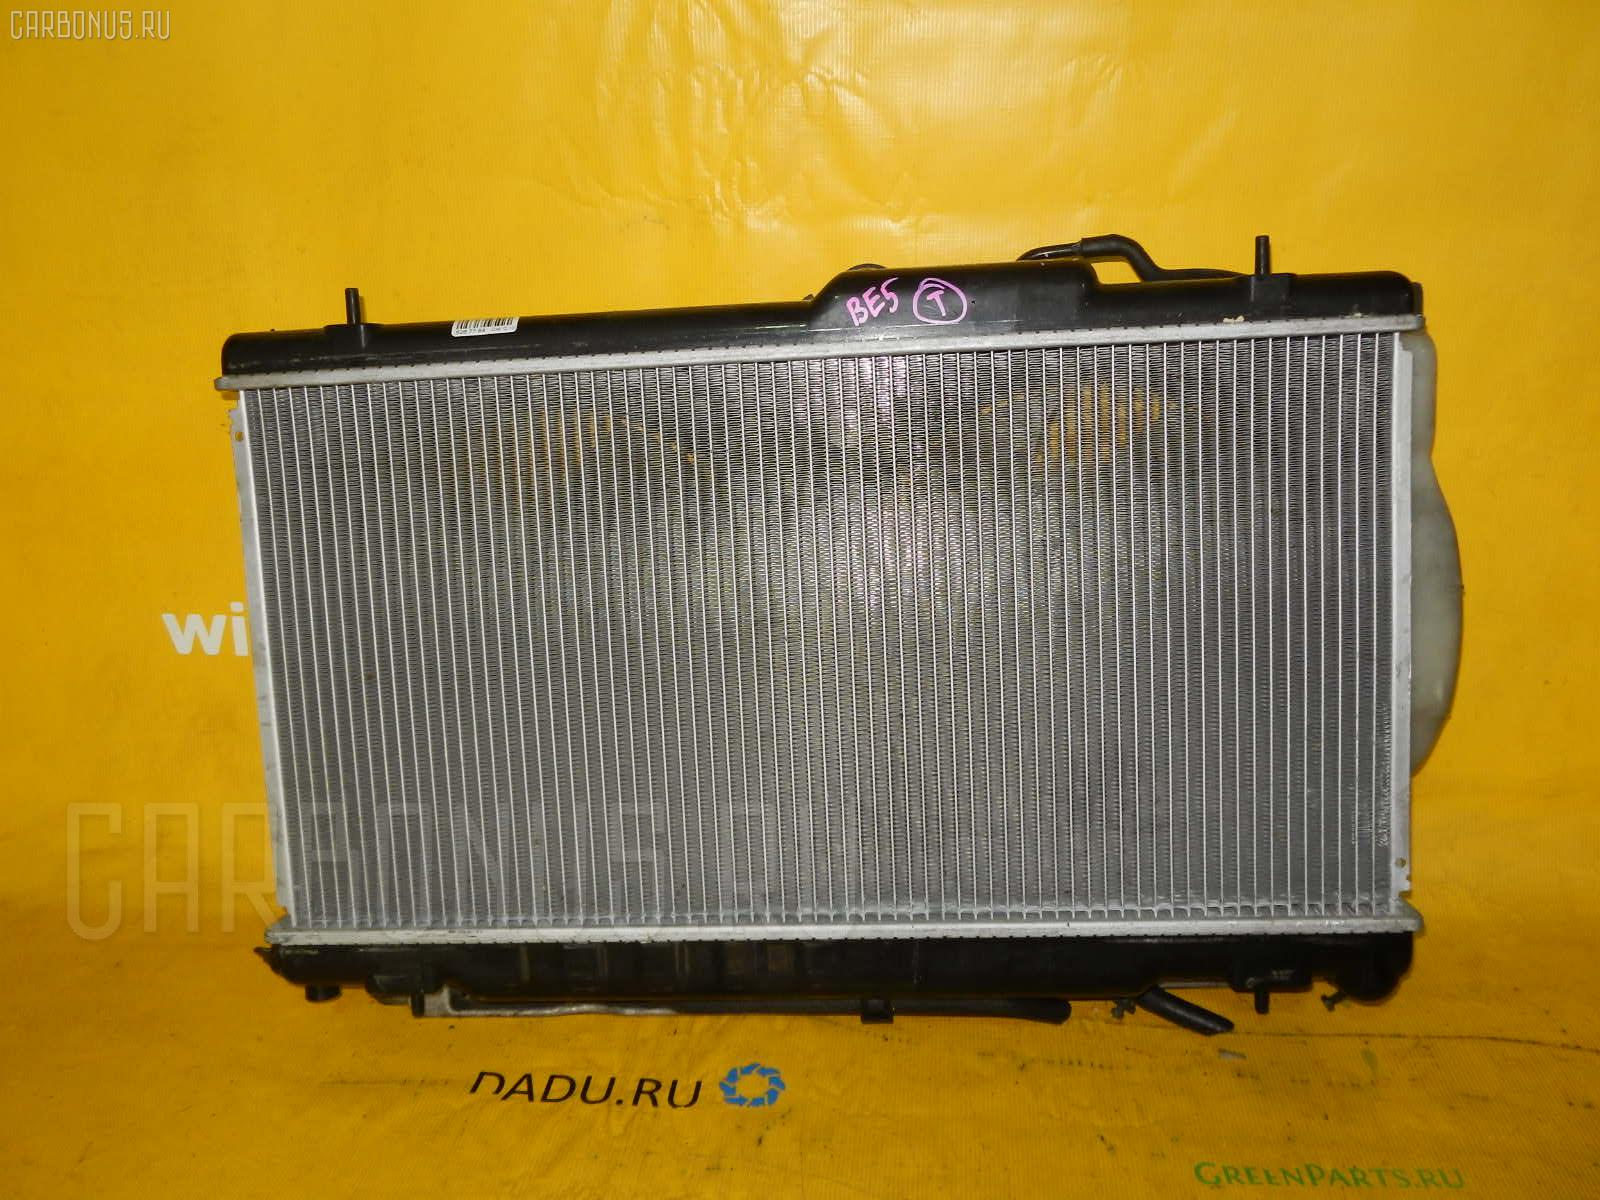 Радиатор ДВС SUBARU LEGACY B4 BE5 EJ20-TT Фото 2